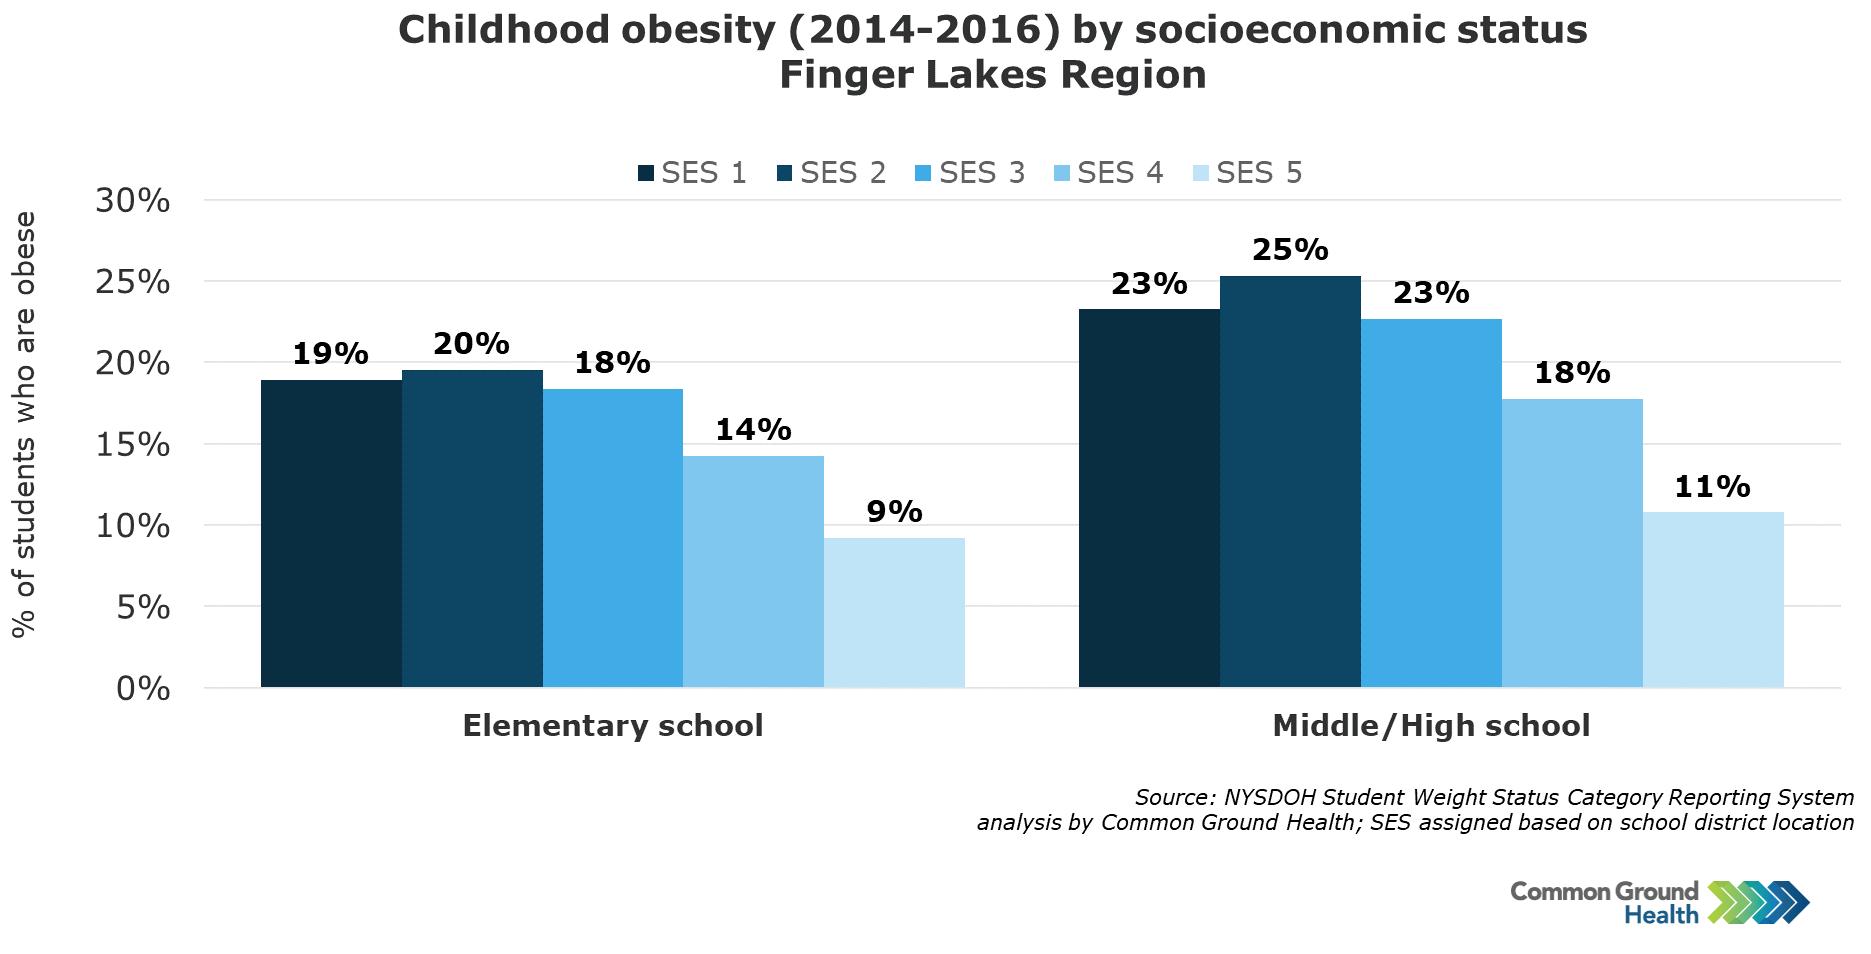 Childhood Obesity by Socioeconomic Status